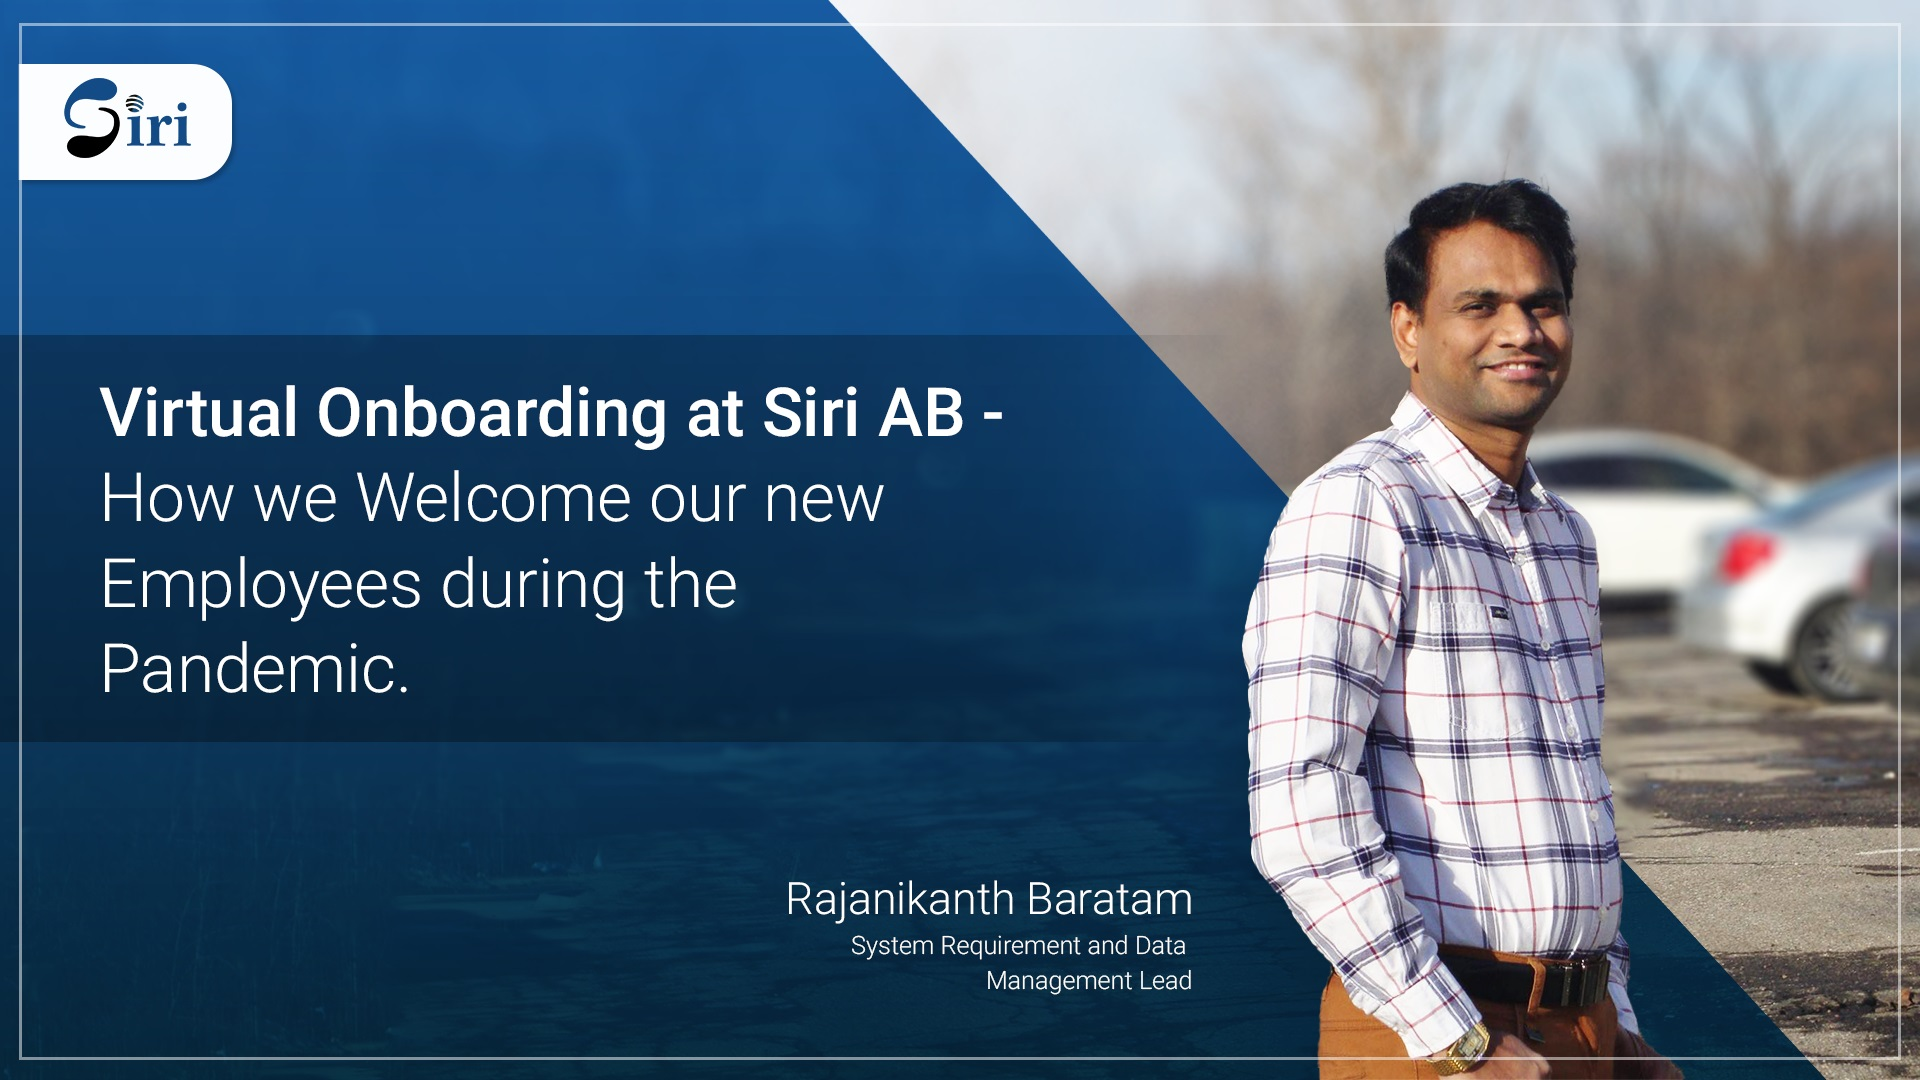 Rajanikanth Baratam Siri AB Virtual Onboarding